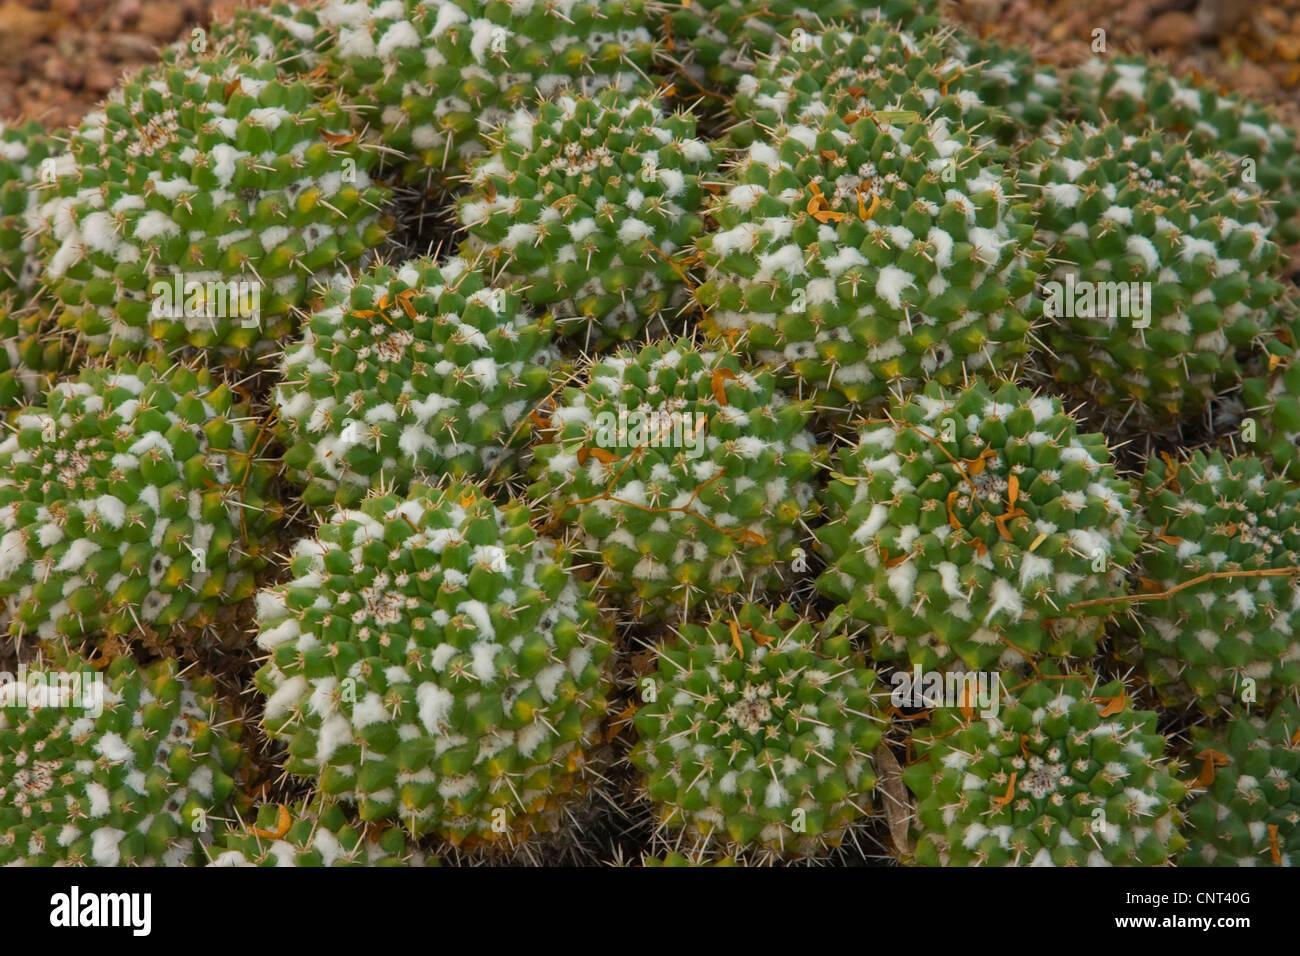 Compressed Cactus (Mammillaria compressa), habit, USA, Arizona - Stock Image